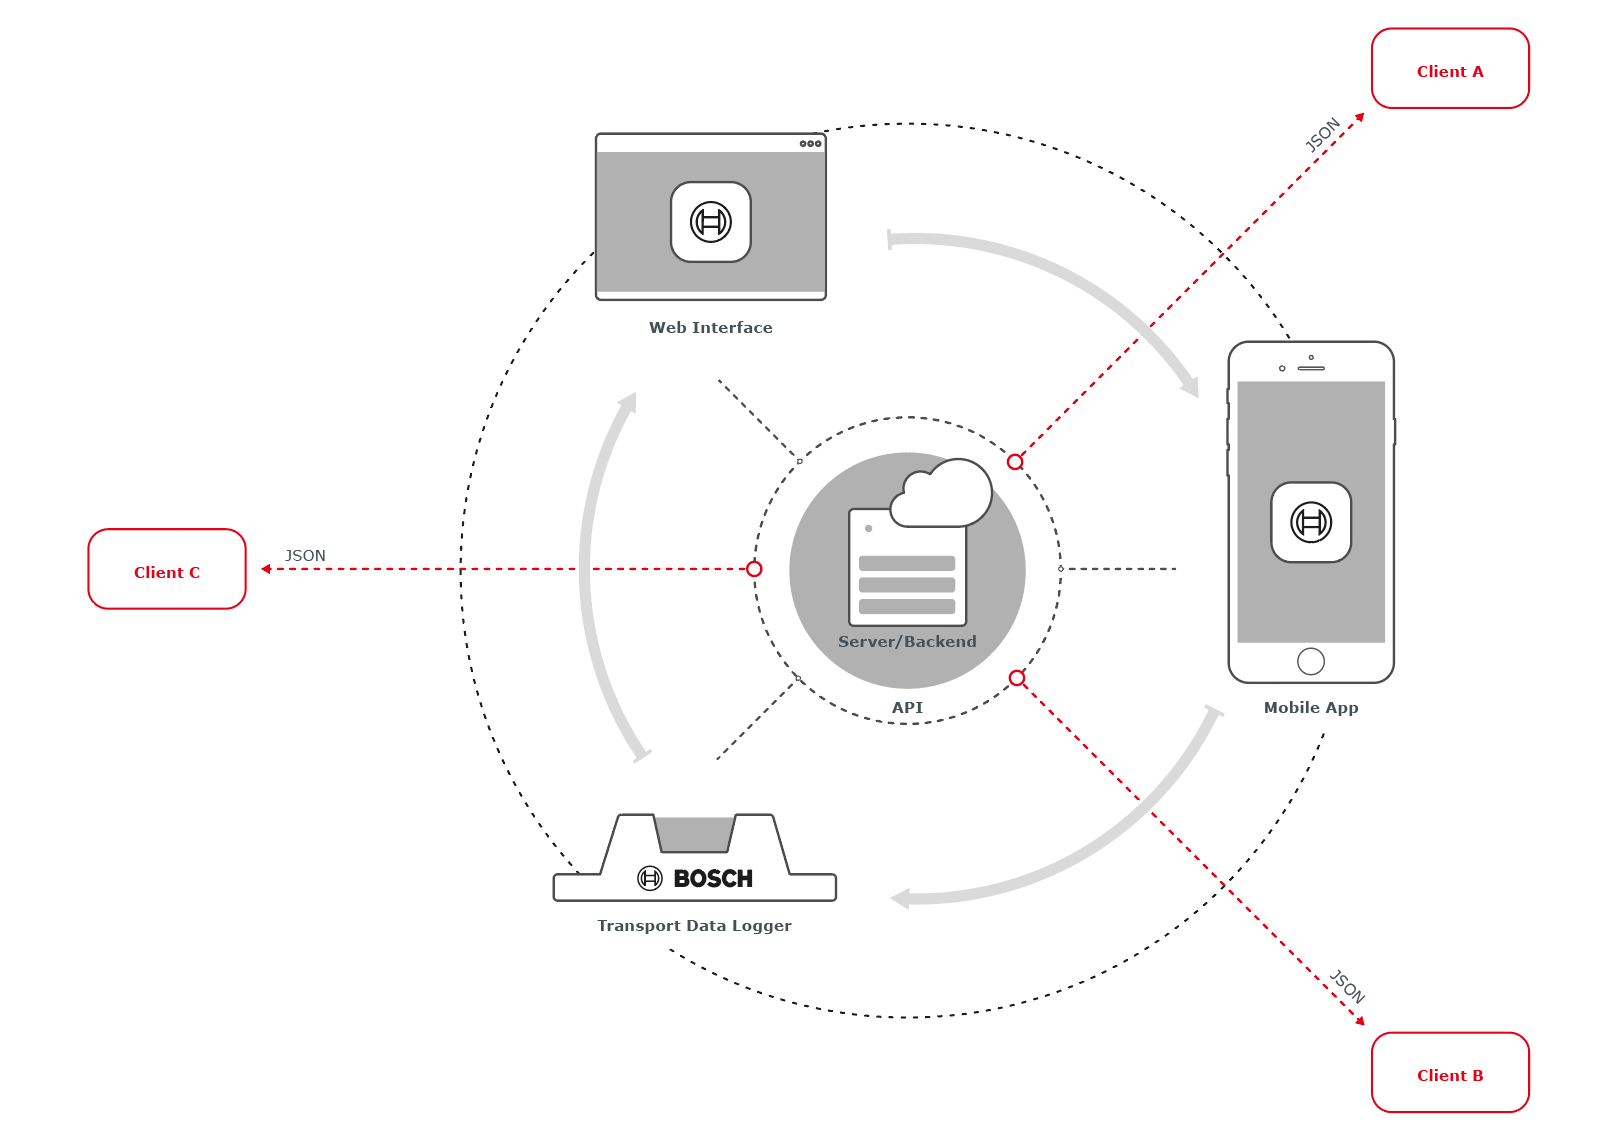 Bosch TDL Ecosystem Vision